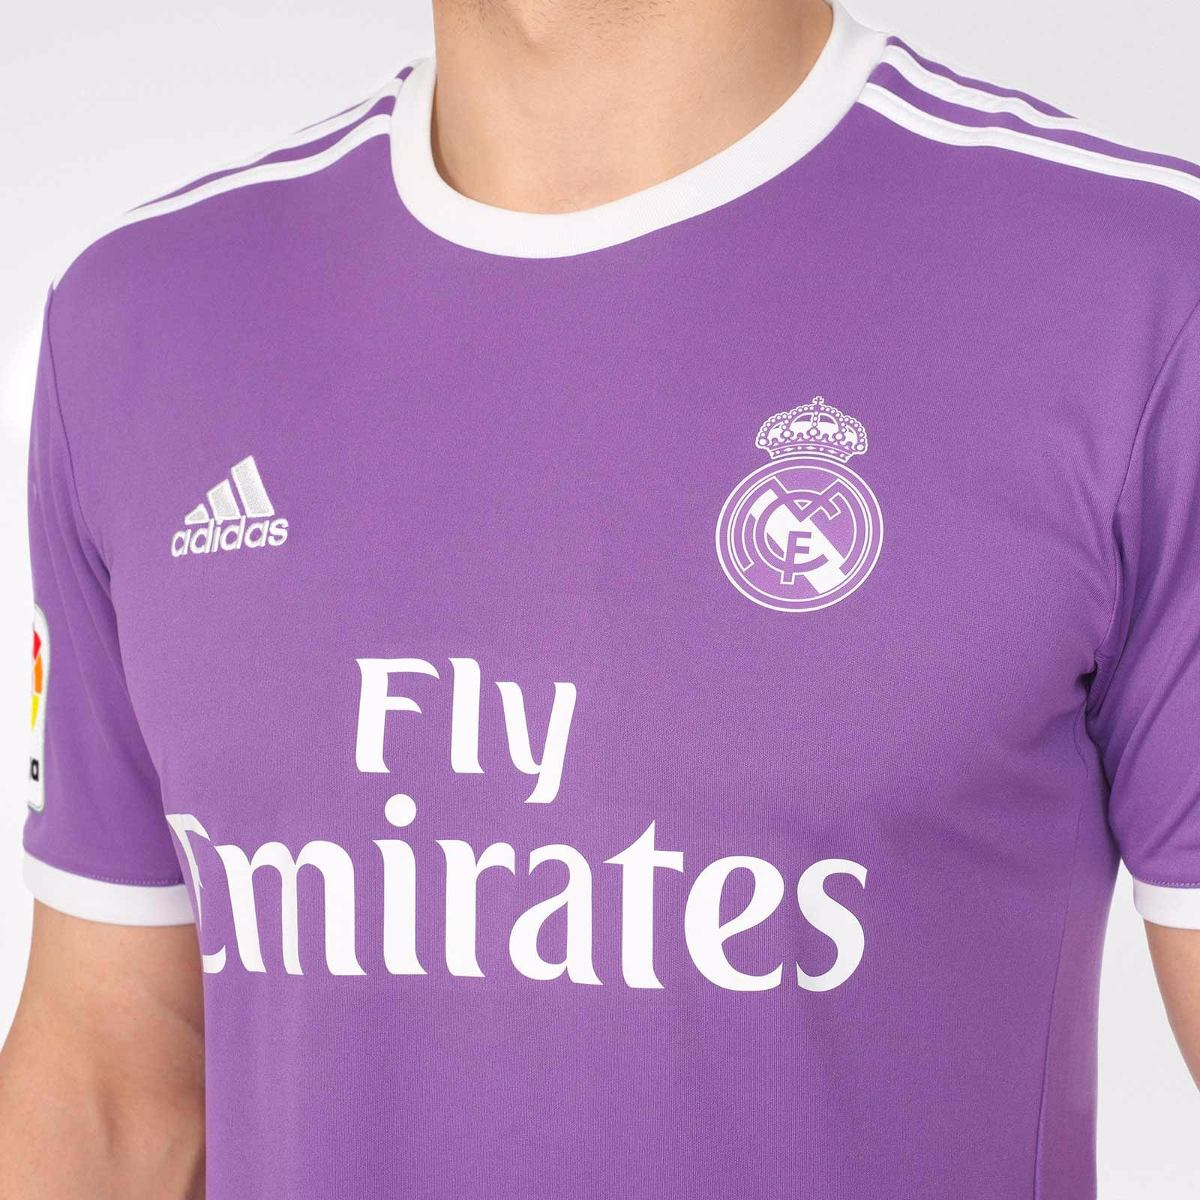 Cargando zoom... camiseta real madrid 2016-2017 climacool campeon del mundo 19a6b26d35351